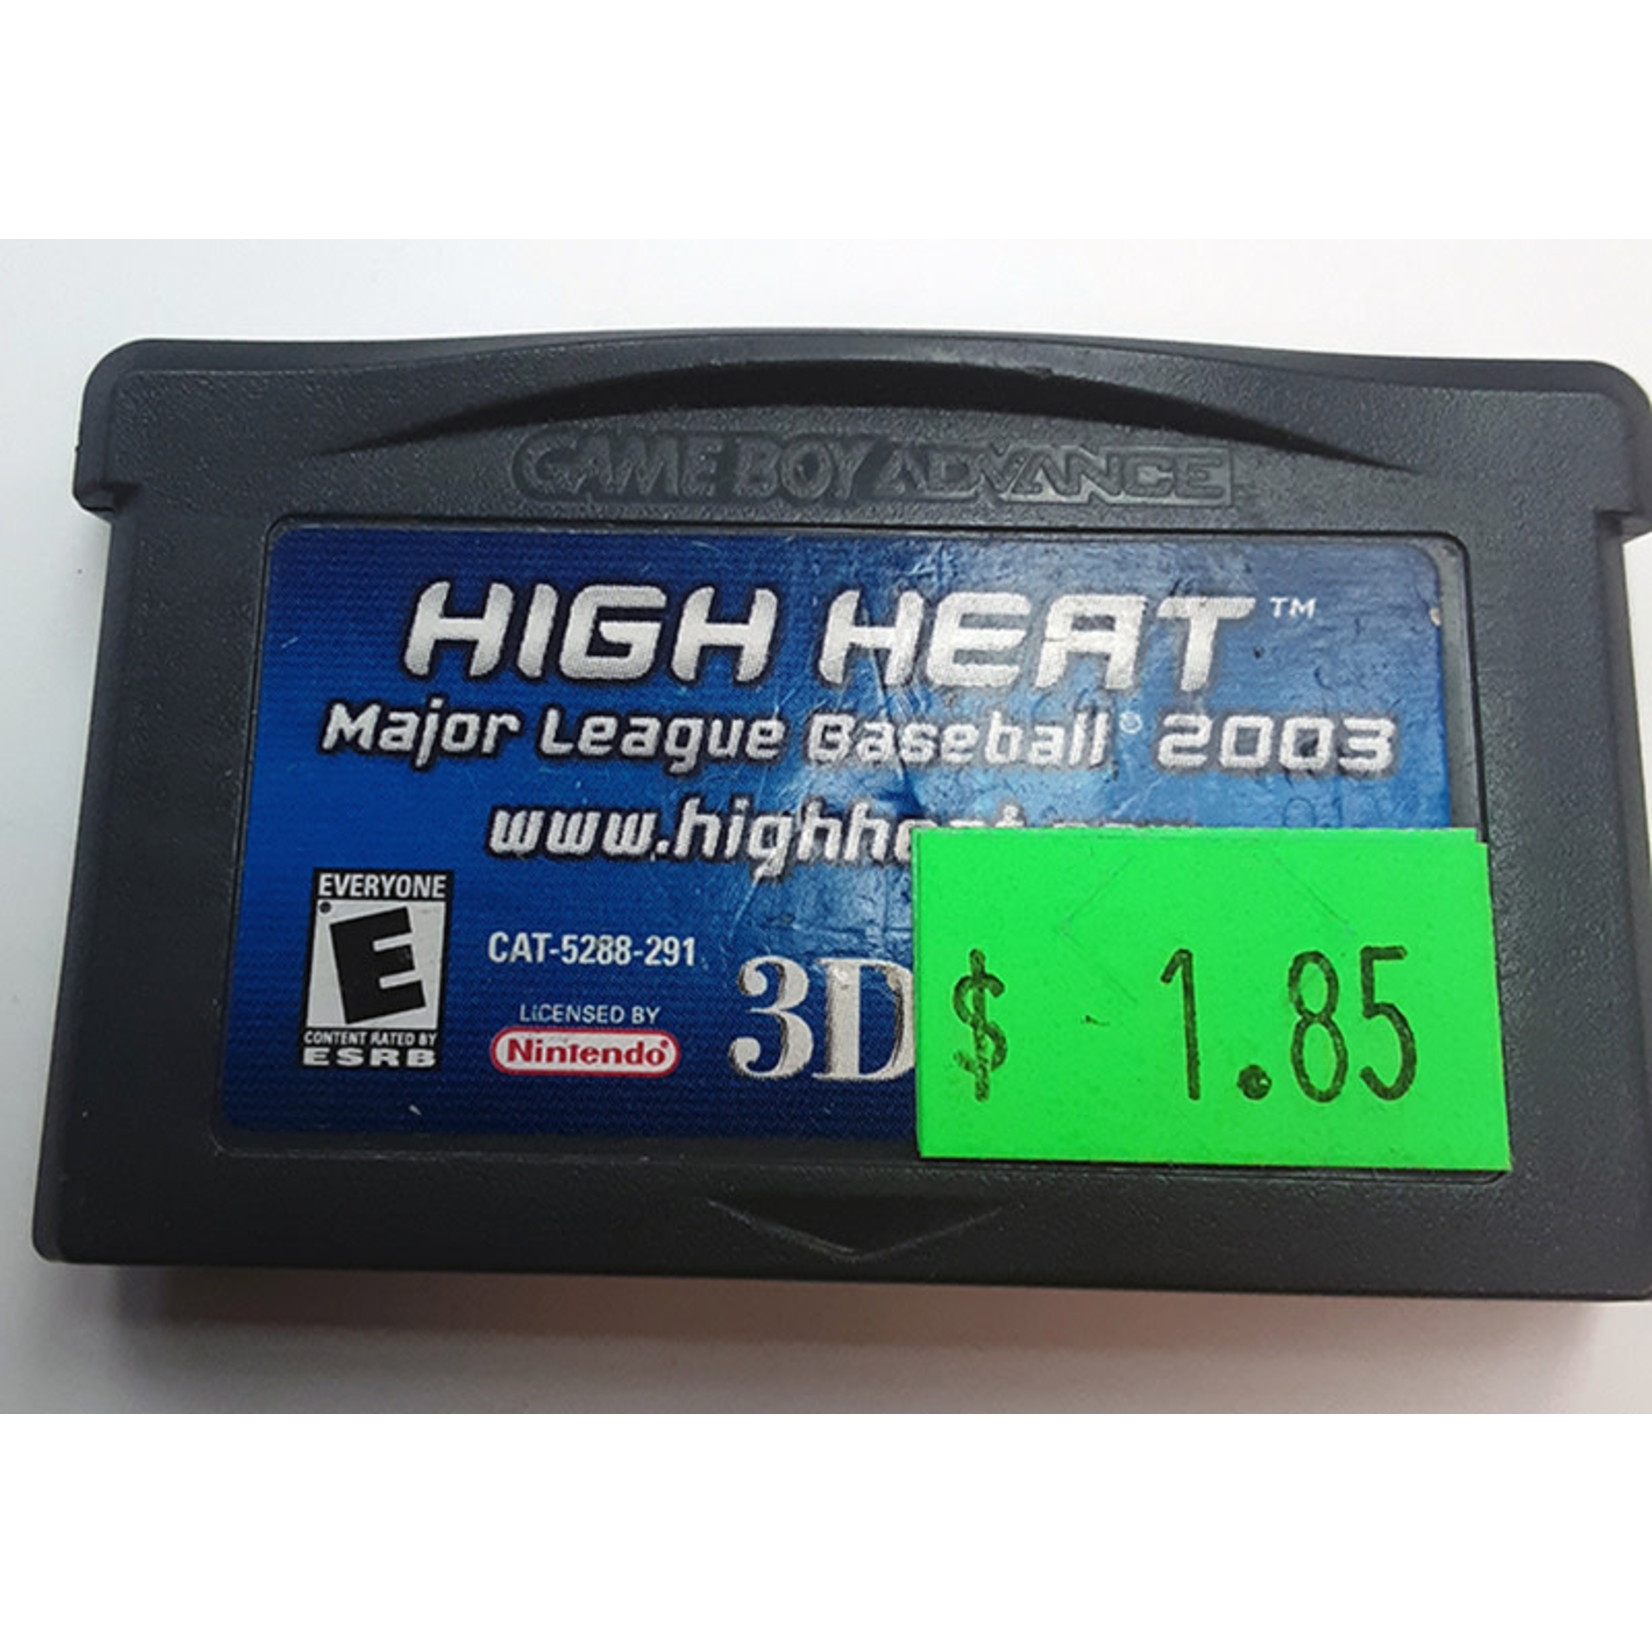 GBAu-High Heat Major League Baseball 2003 (cartridge)